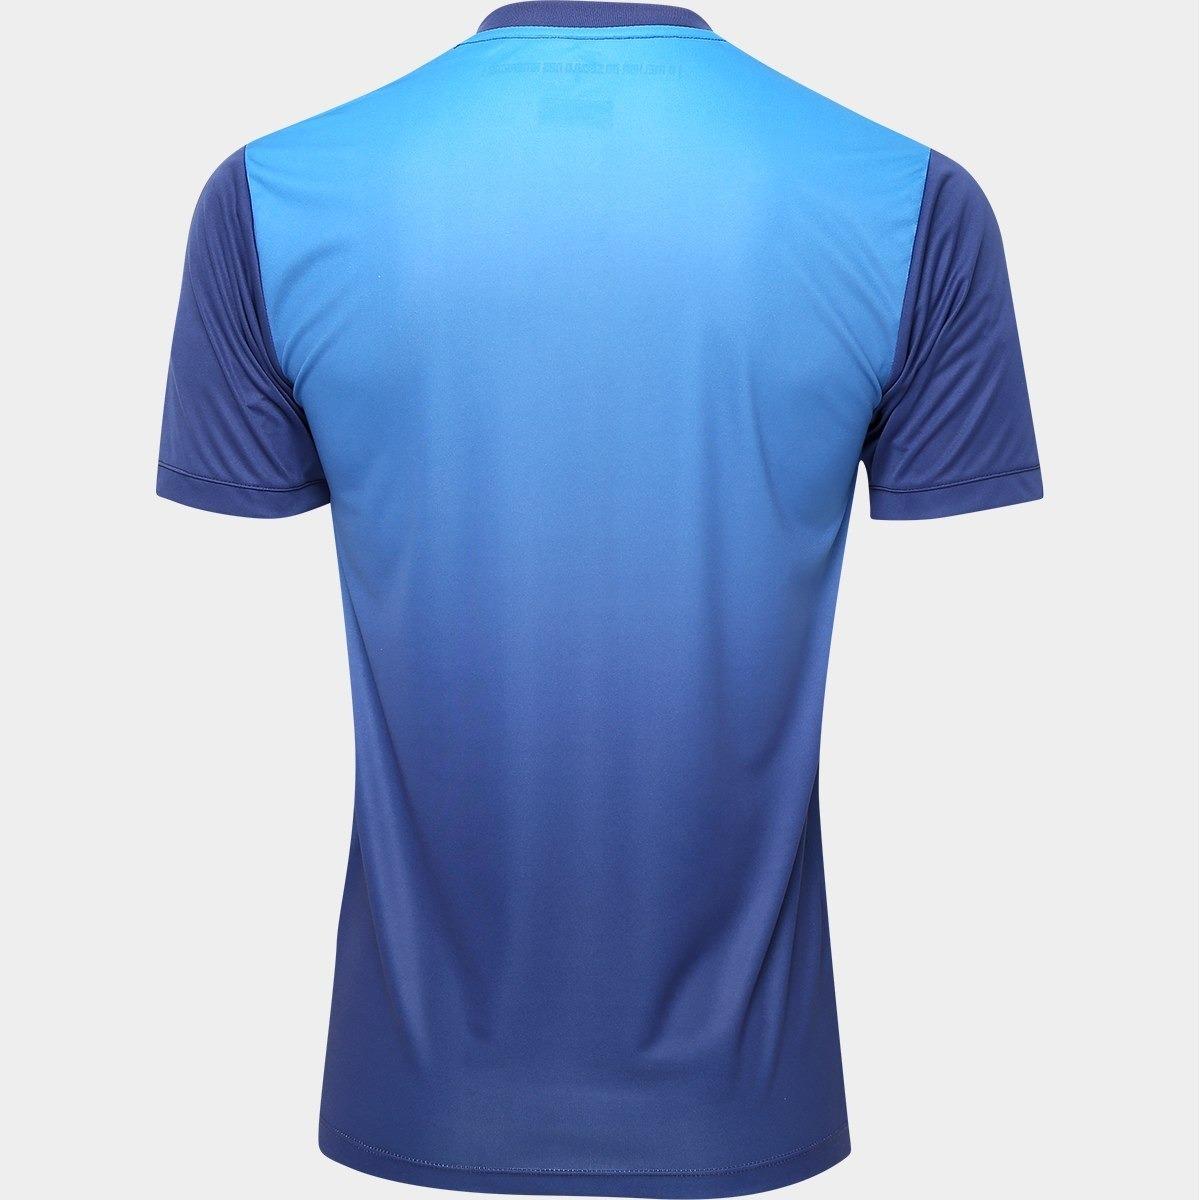 camisa santos iii 2016 s nº torcedor kappa ks2569004. Carregando zoom. b54509ec88070